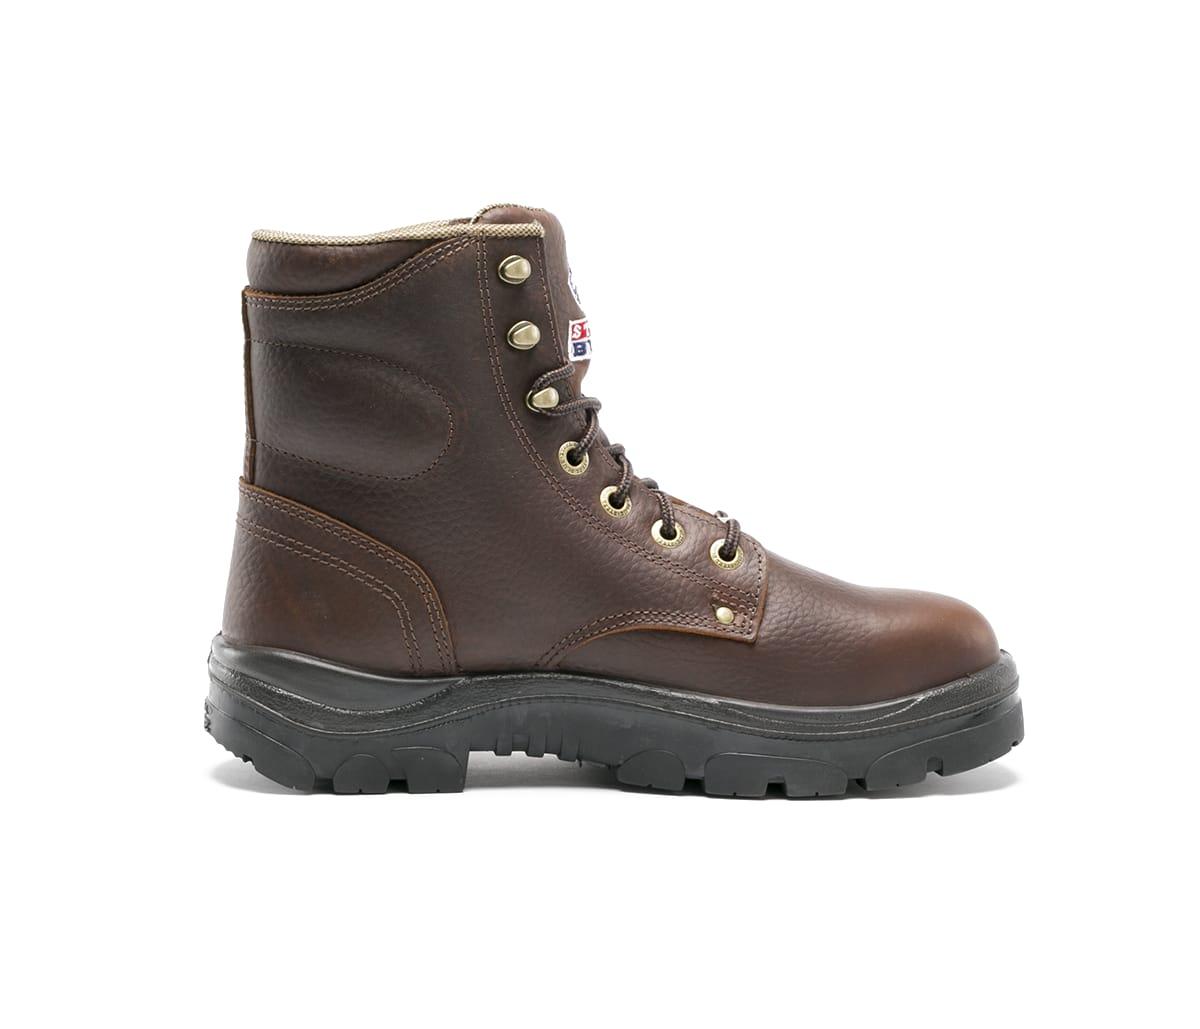 Steel Blue Work Boots Men S Boots Argyle 100 Comfort